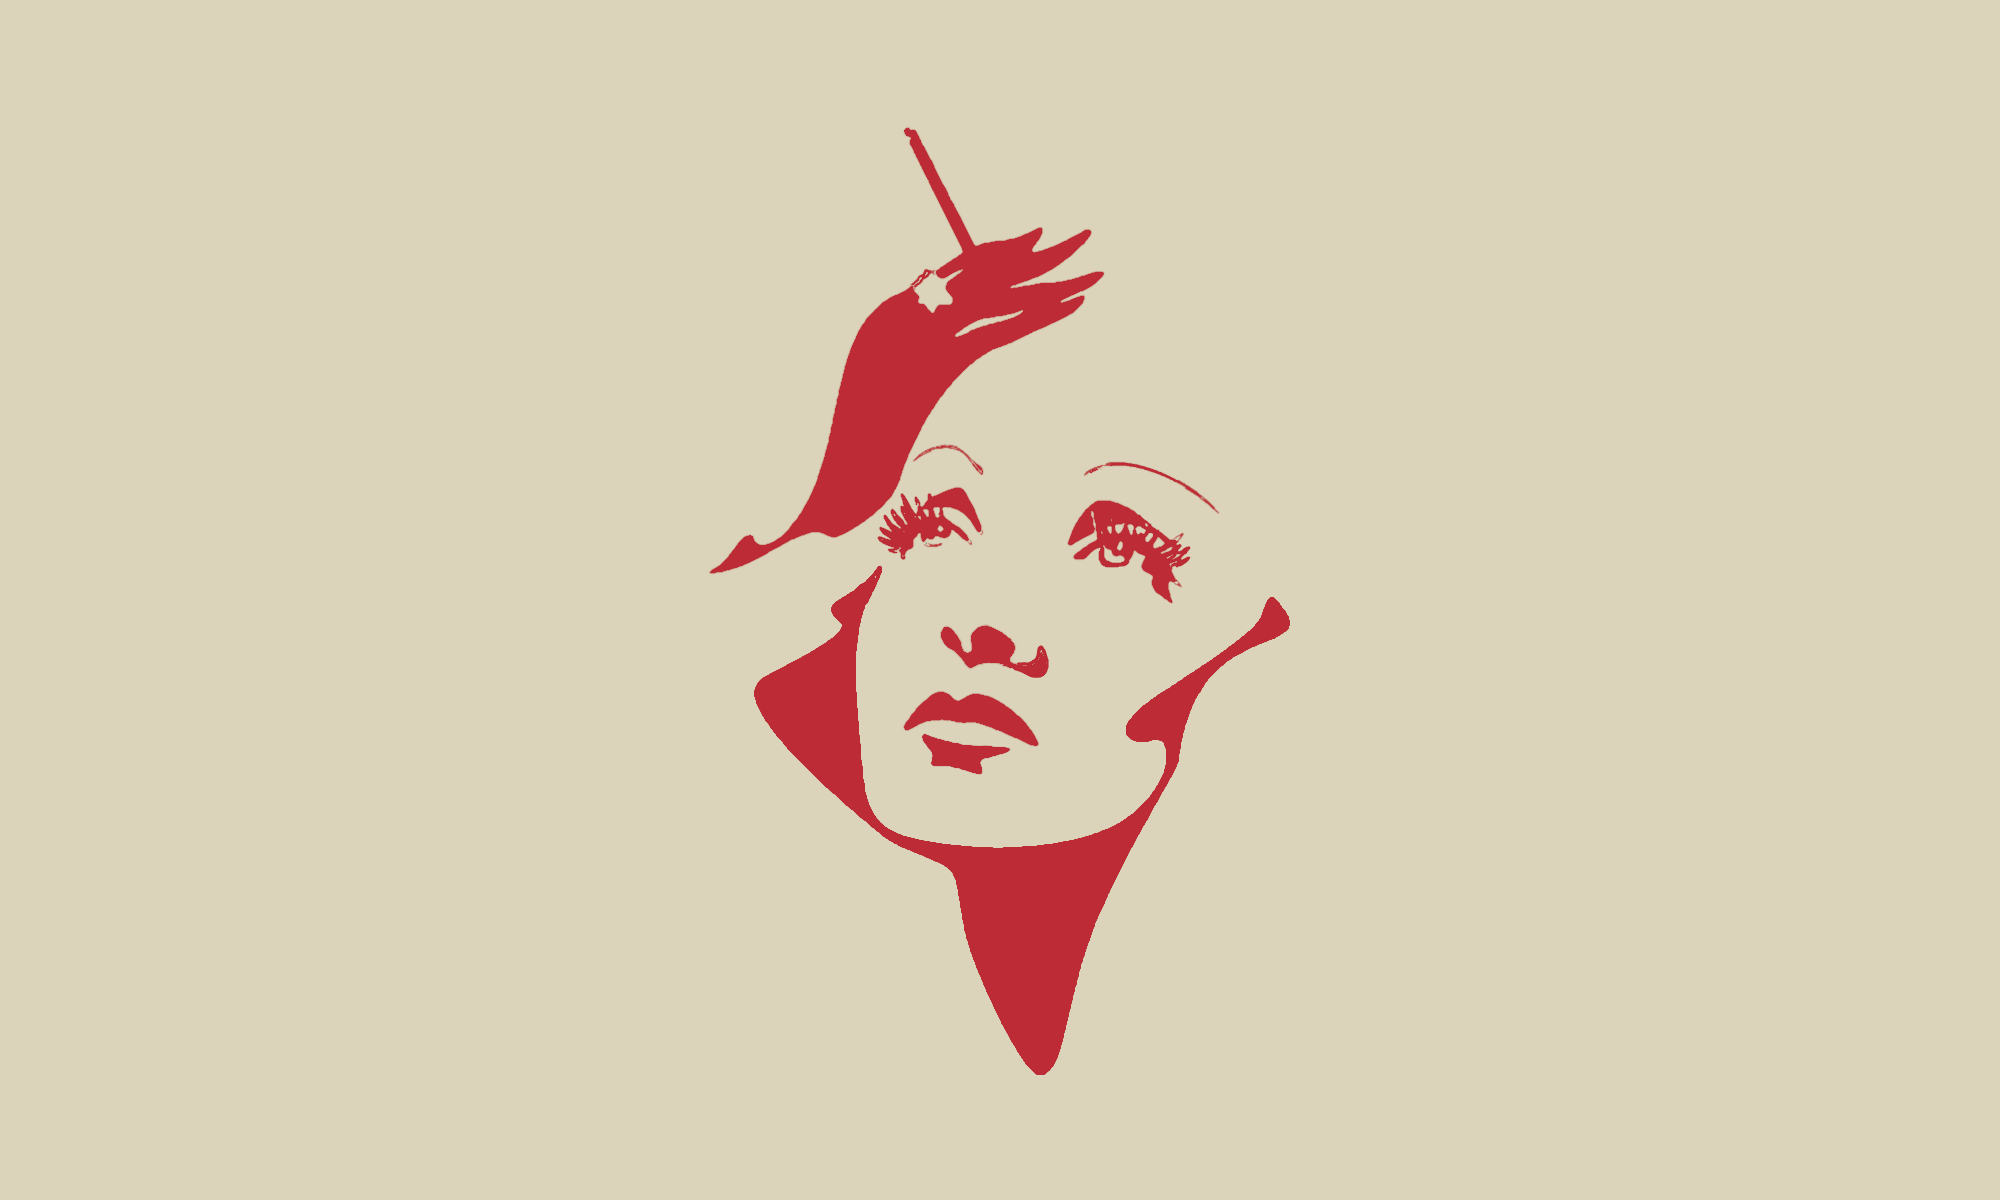 Arte e femme fatale - ADO Analisidellopera